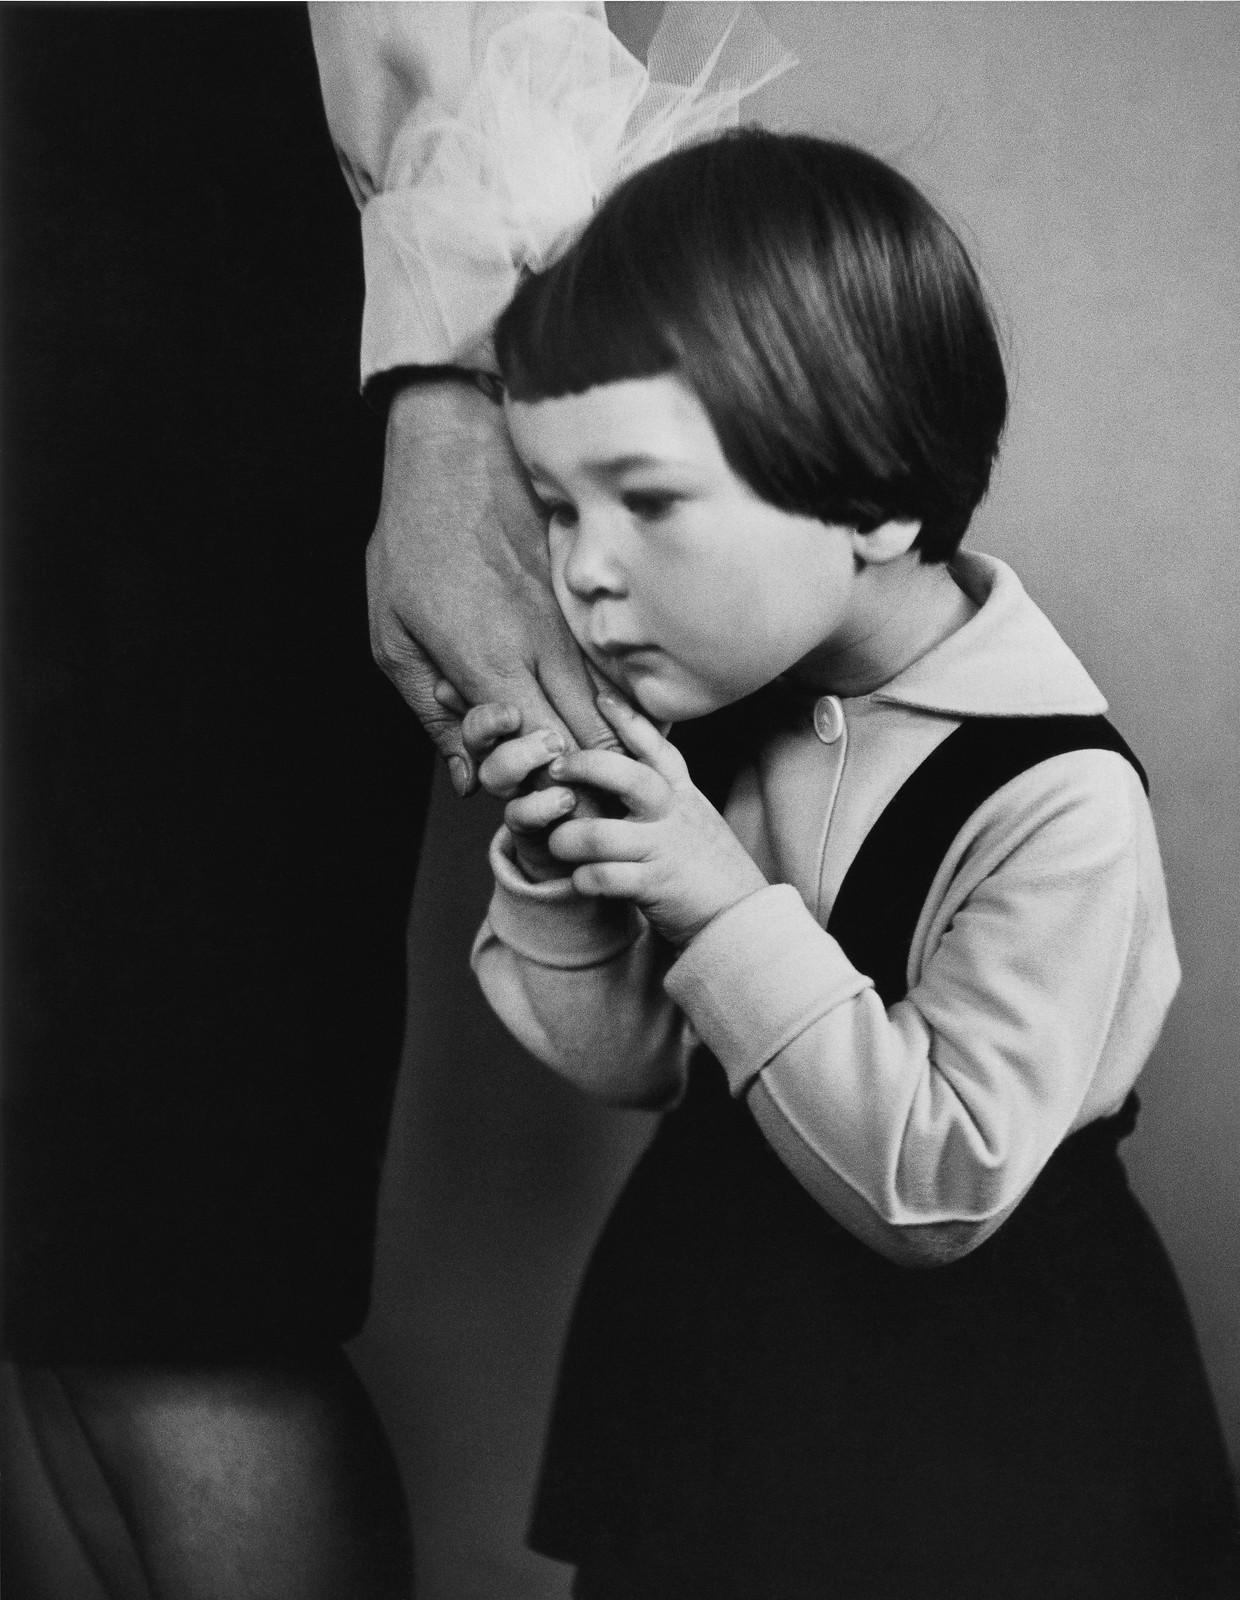 29. 1965. Руки матери